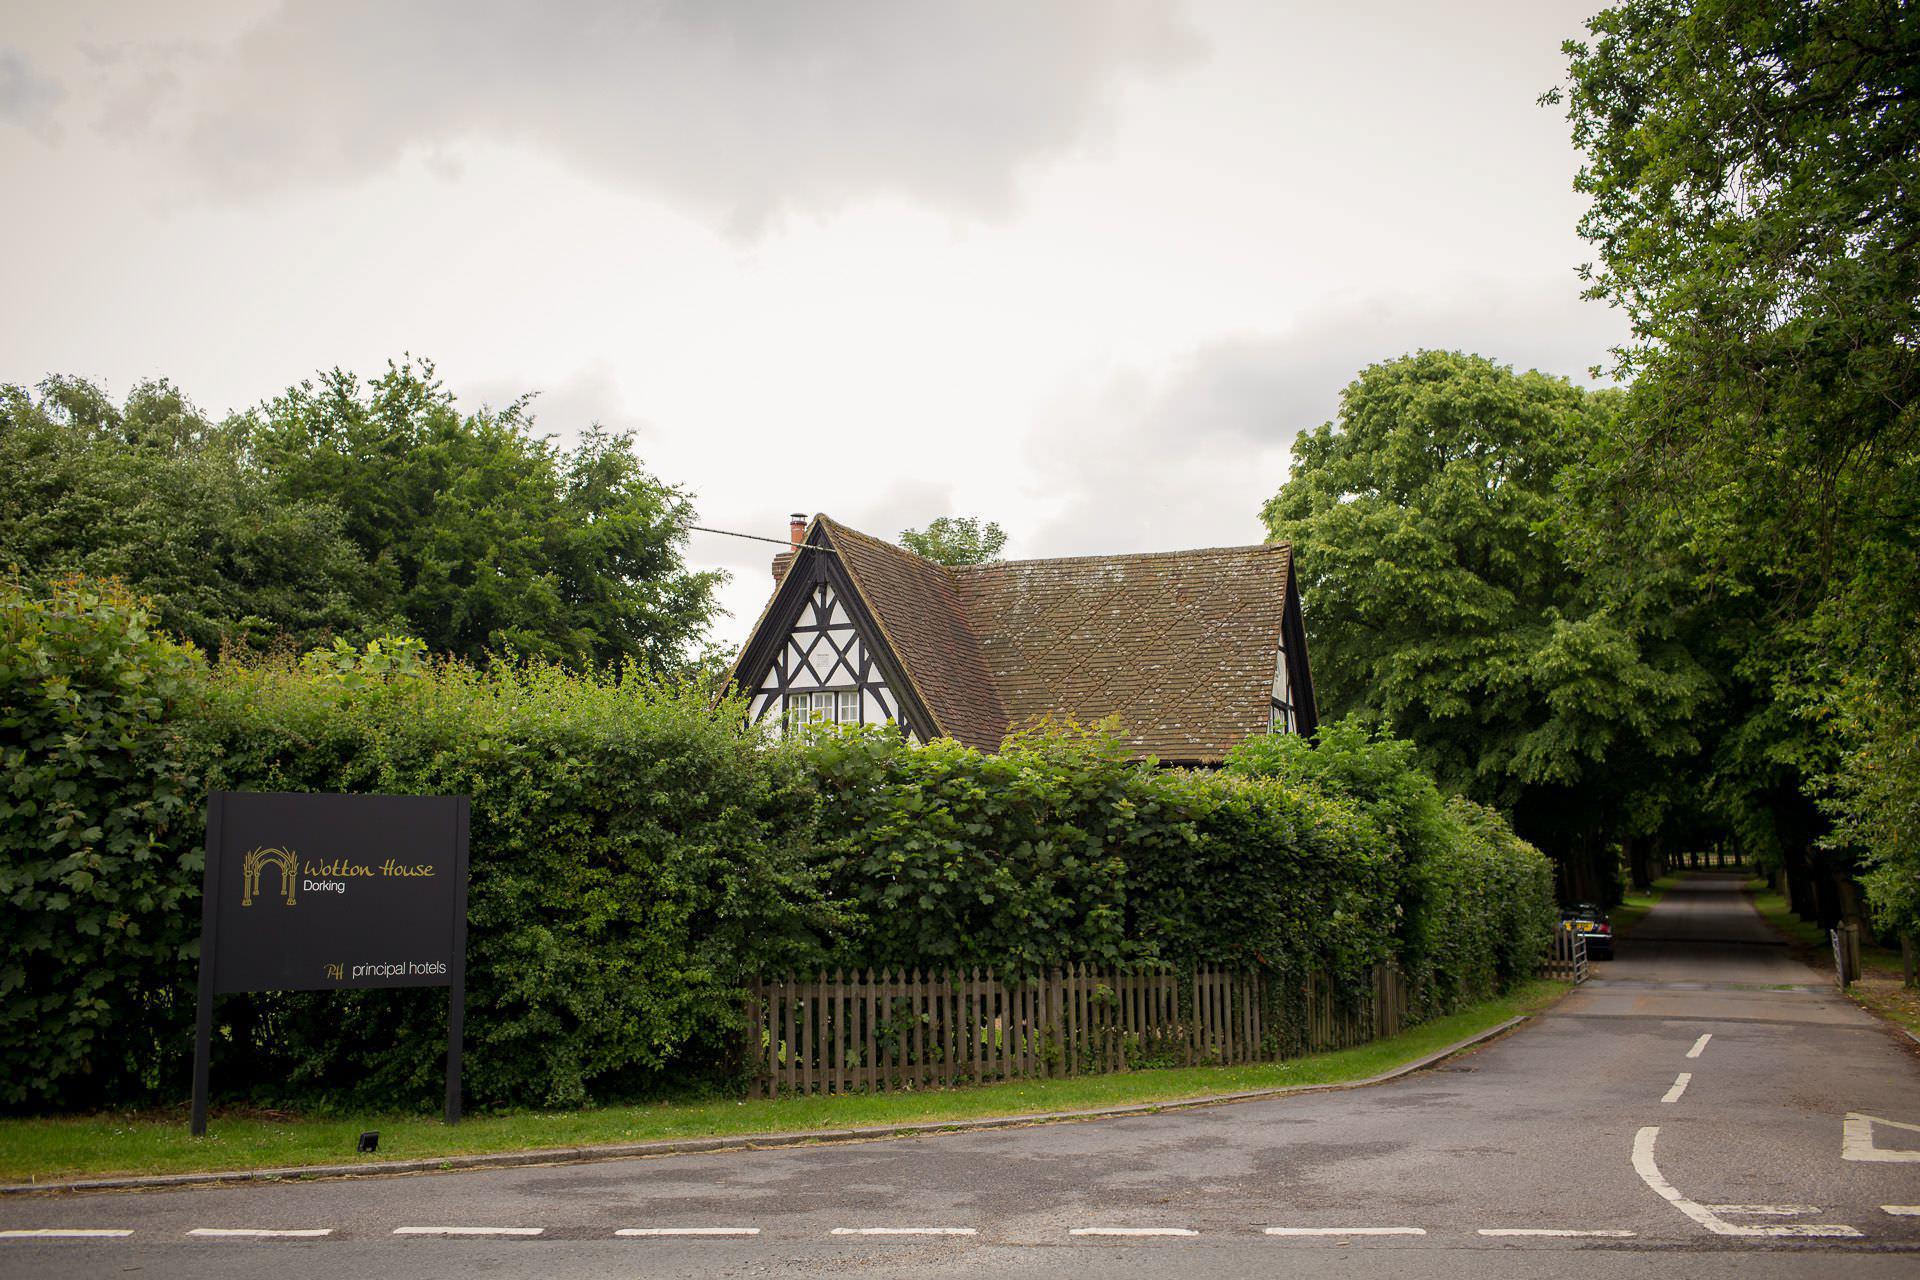 Wotton House wedding entrance